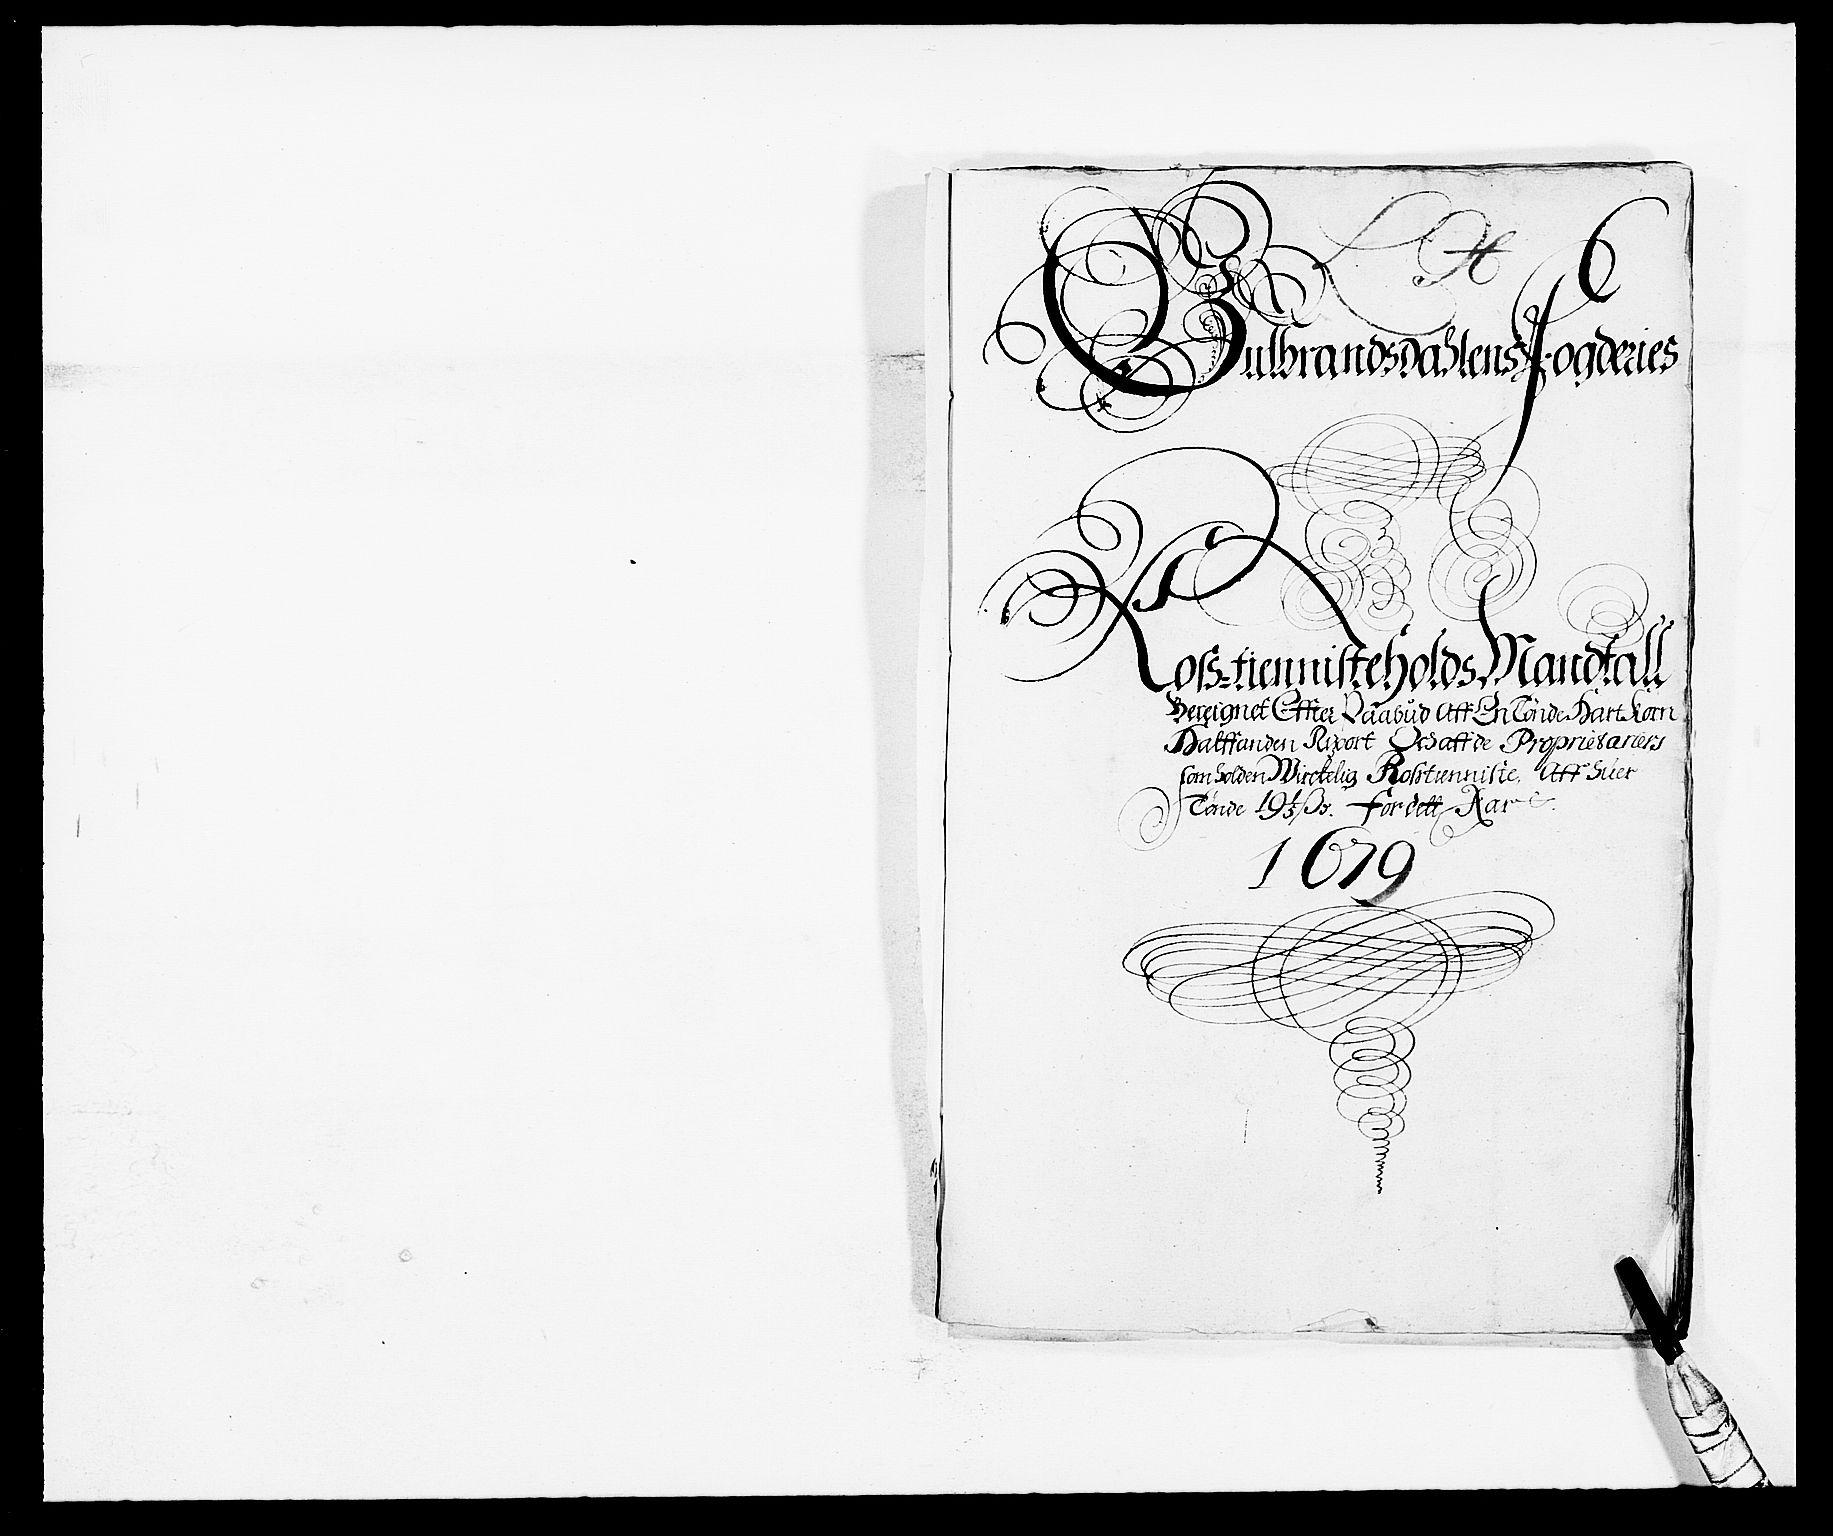 RA, Rentekammeret inntil 1814, Reviderte regnskaper, Fogderegnskap, R17/L1153: Fogderegnskap Gudbrandsdal, 1678-1679, s. 344